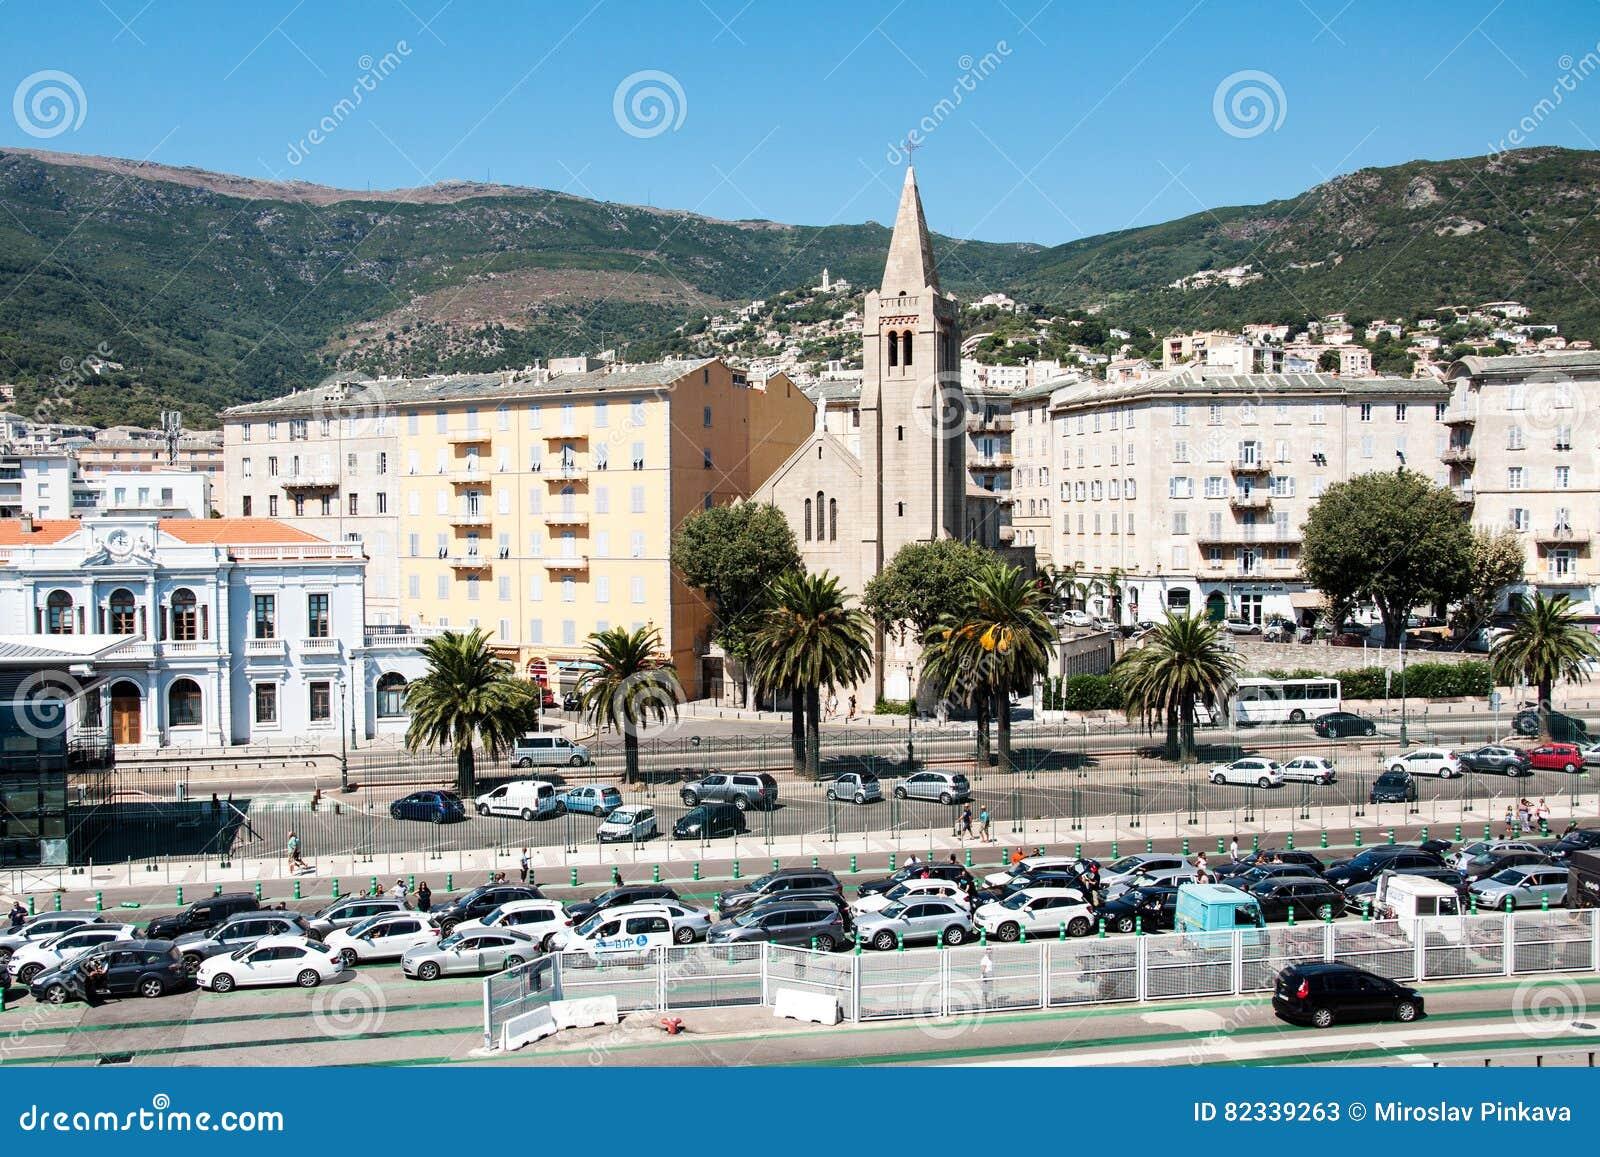 Port Of Bastia Corsika Editorial Stock Photo Image Of Dock 82339263